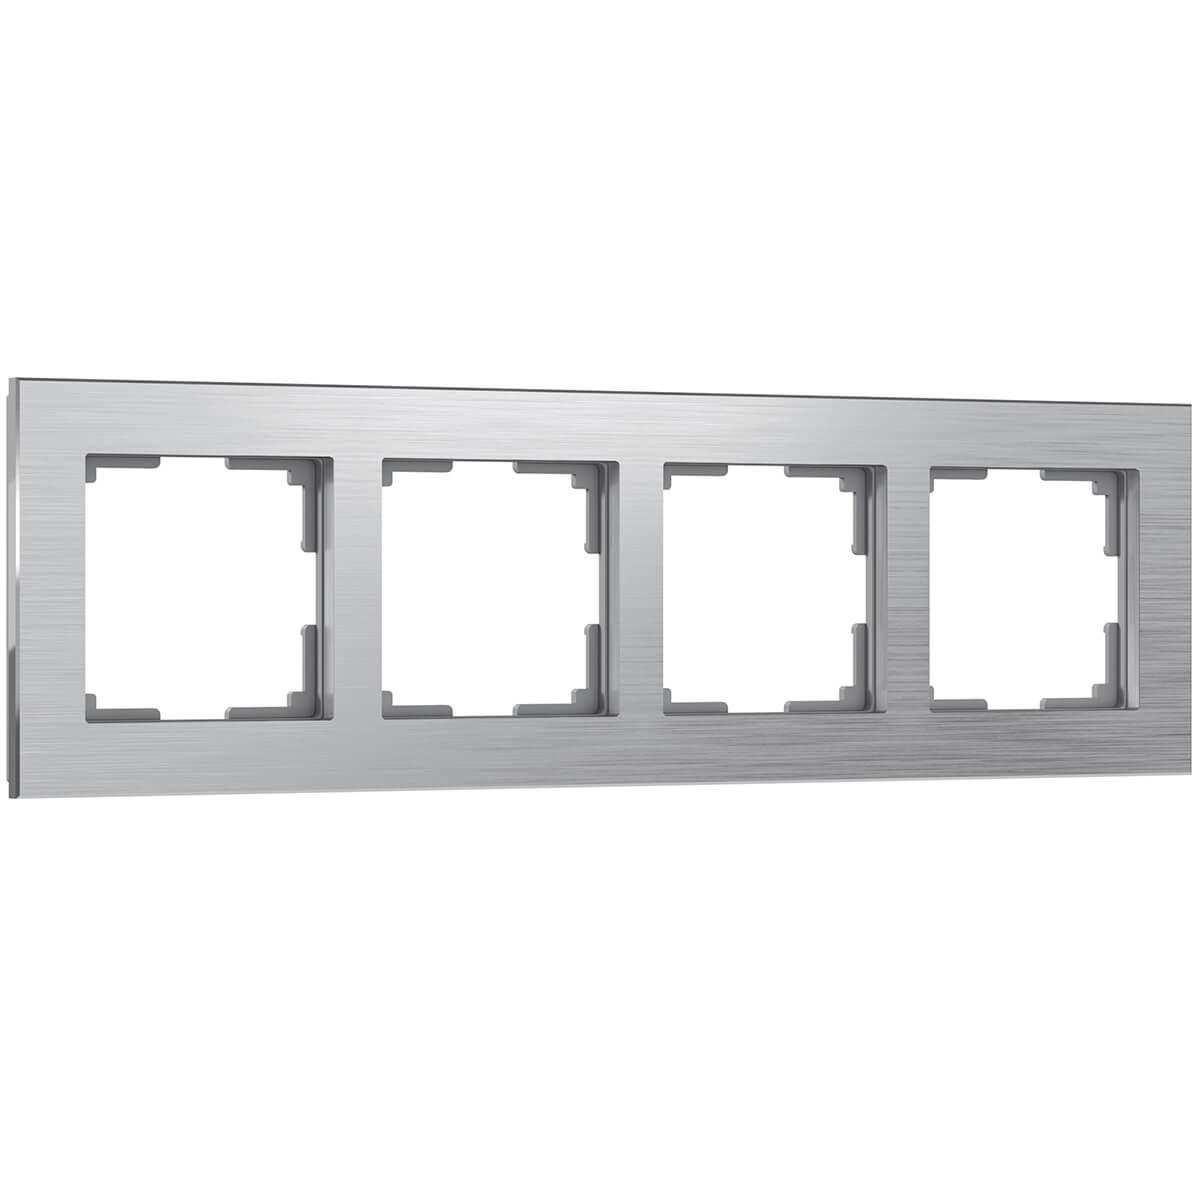 Рамка Aluminium на 4 поста алюминий WL11-Frame-04 4690389073663 цена